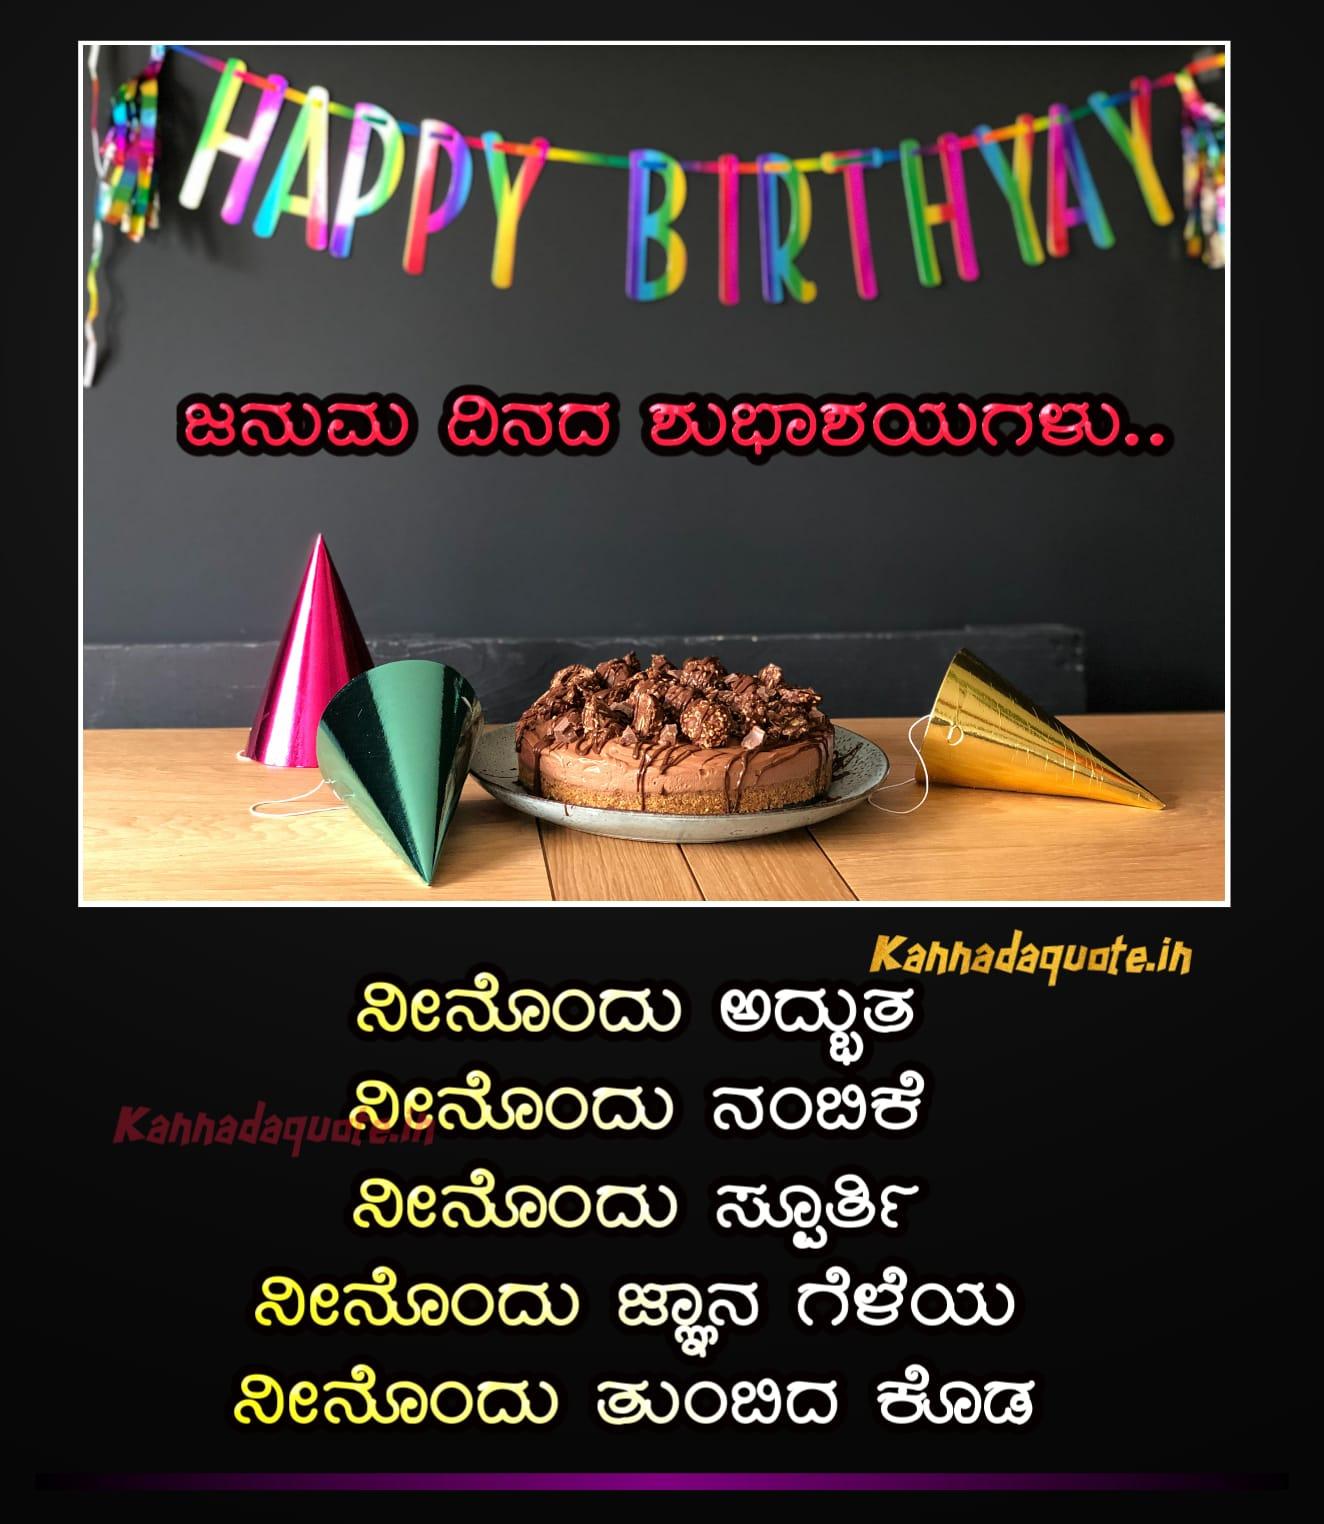 40 Happy Birthday Wishes In Kannada Language 2021 Santhosh anudhu odhu thrikonavadhadu helavu sariyagi niravagi mathu sukha santhosh thumbira biku nambike ninu helaragu anchuthiya thumba thagulthiya salpa dinadali mathu heradhu dinadali barute nin huttu habba dina. 40 happy birthday wishes in kannada language 2021